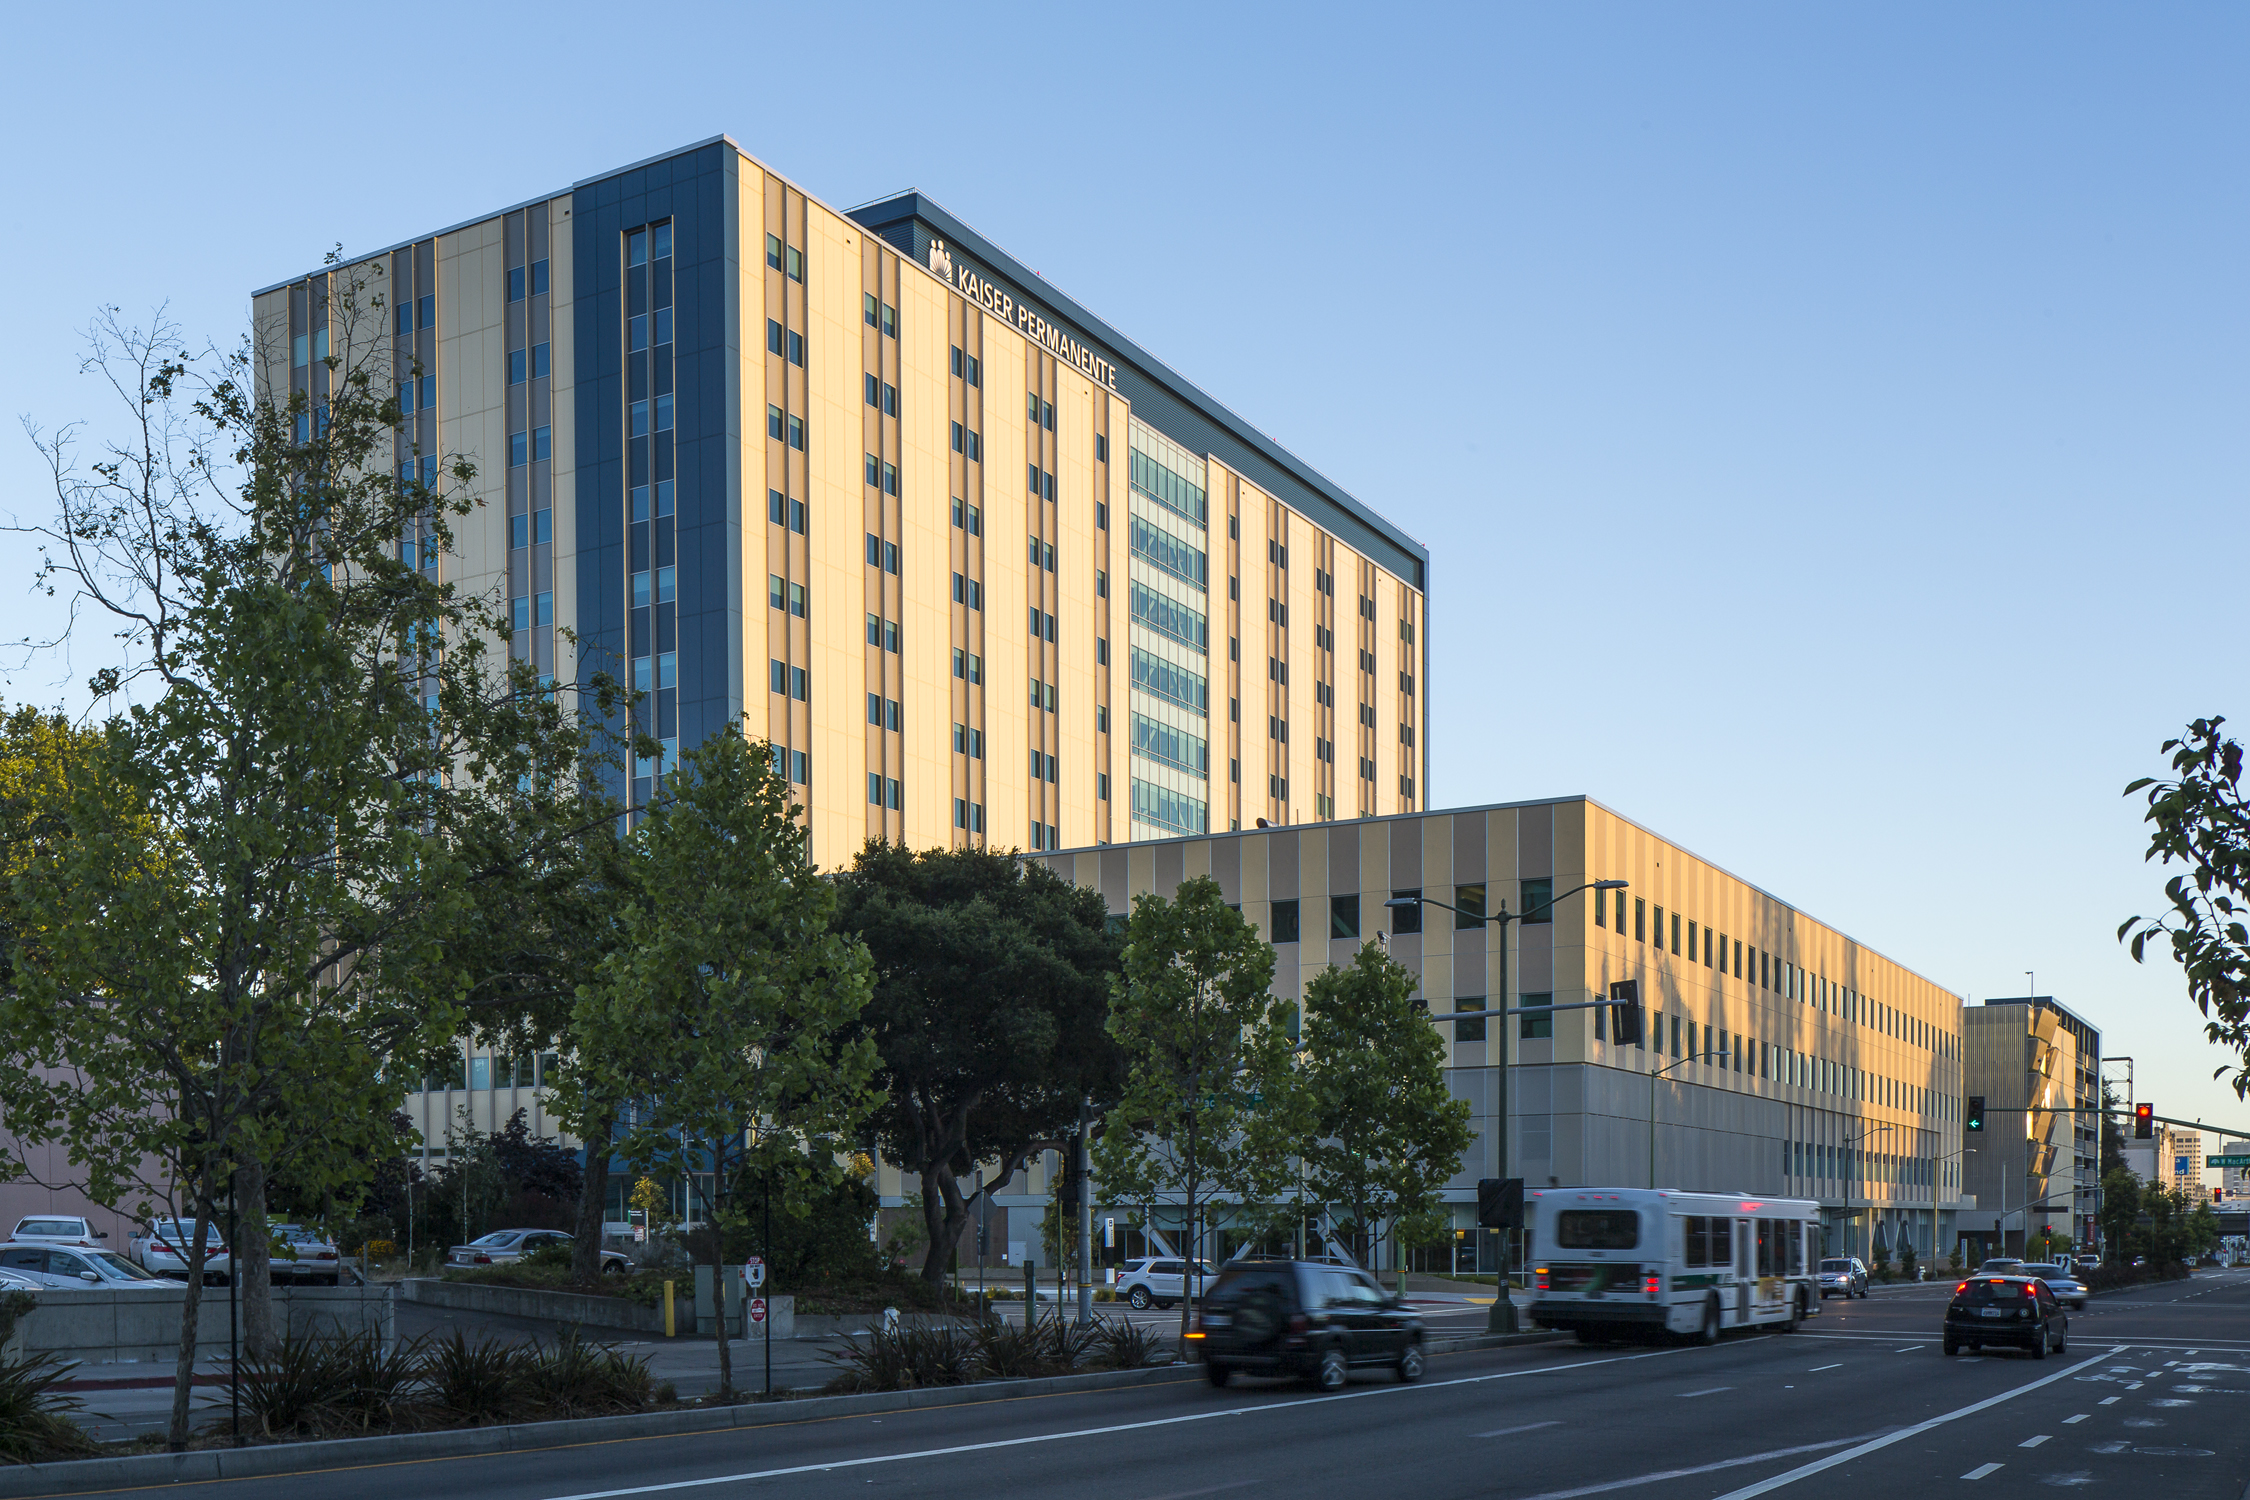 Kaiser Permanente, Specialty Medical Office Building